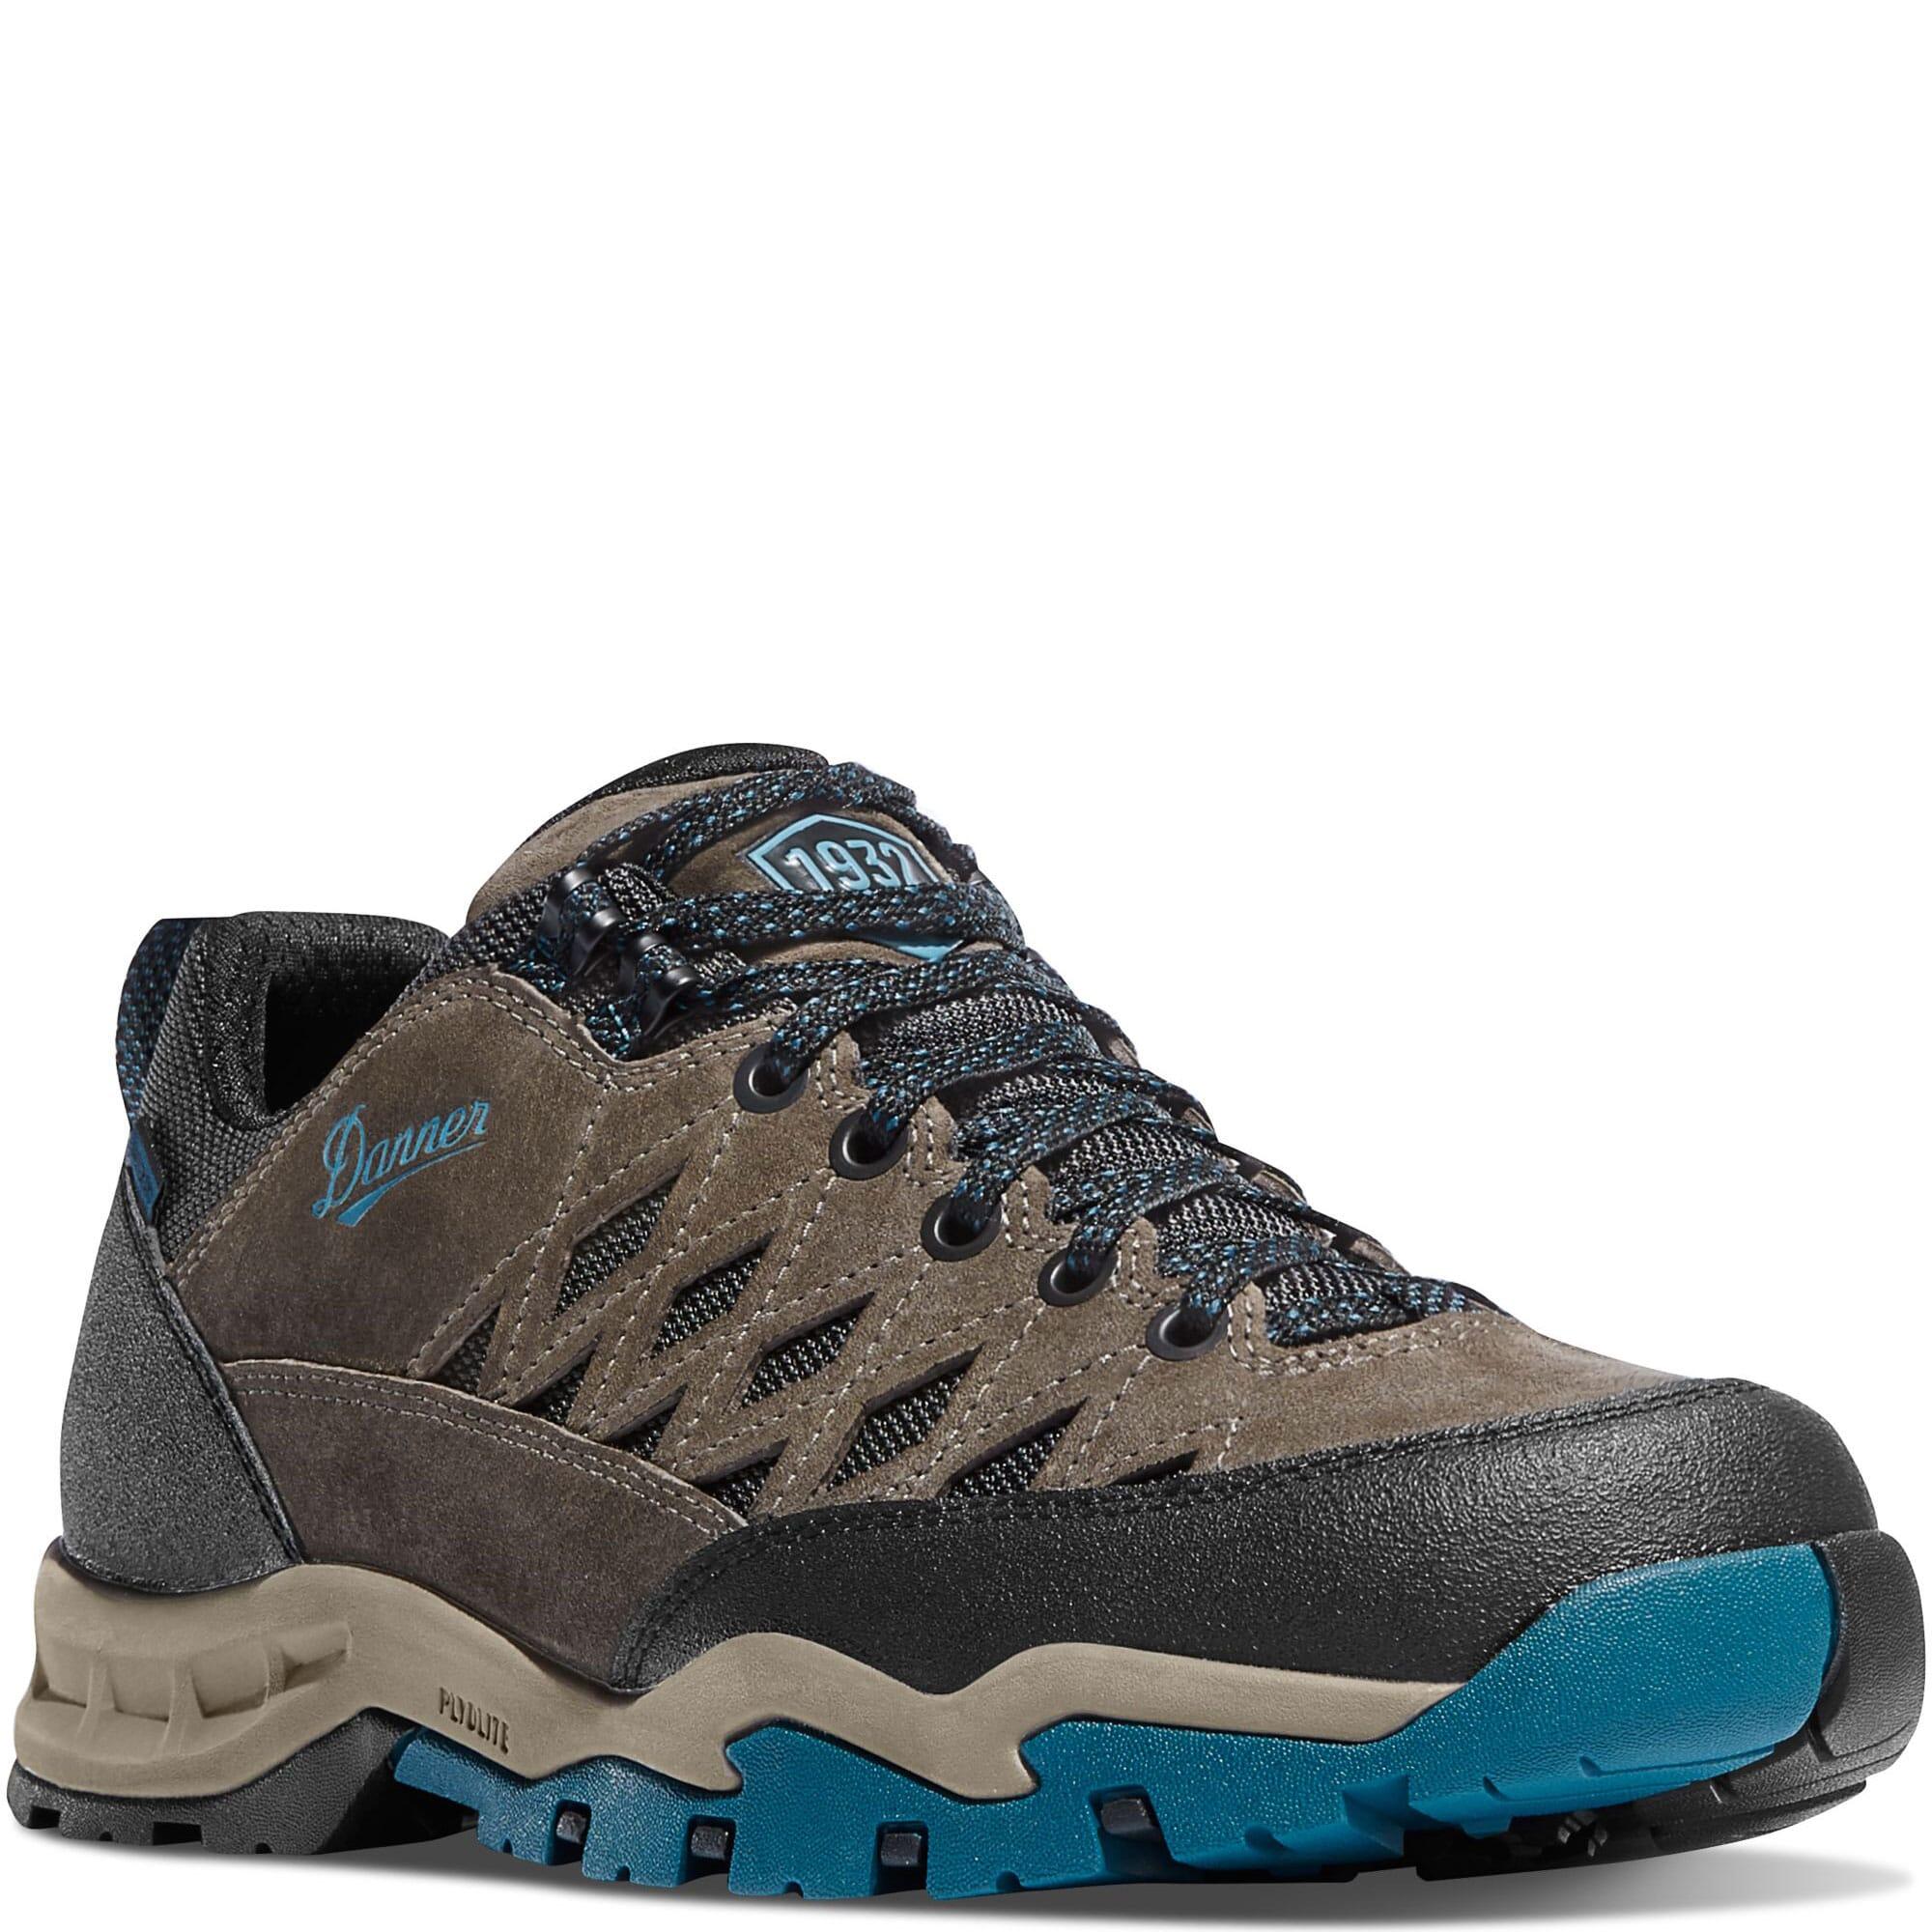 Image for Danner Men's TrailTrek Hiking Boots - Gray/Blue from bootbay